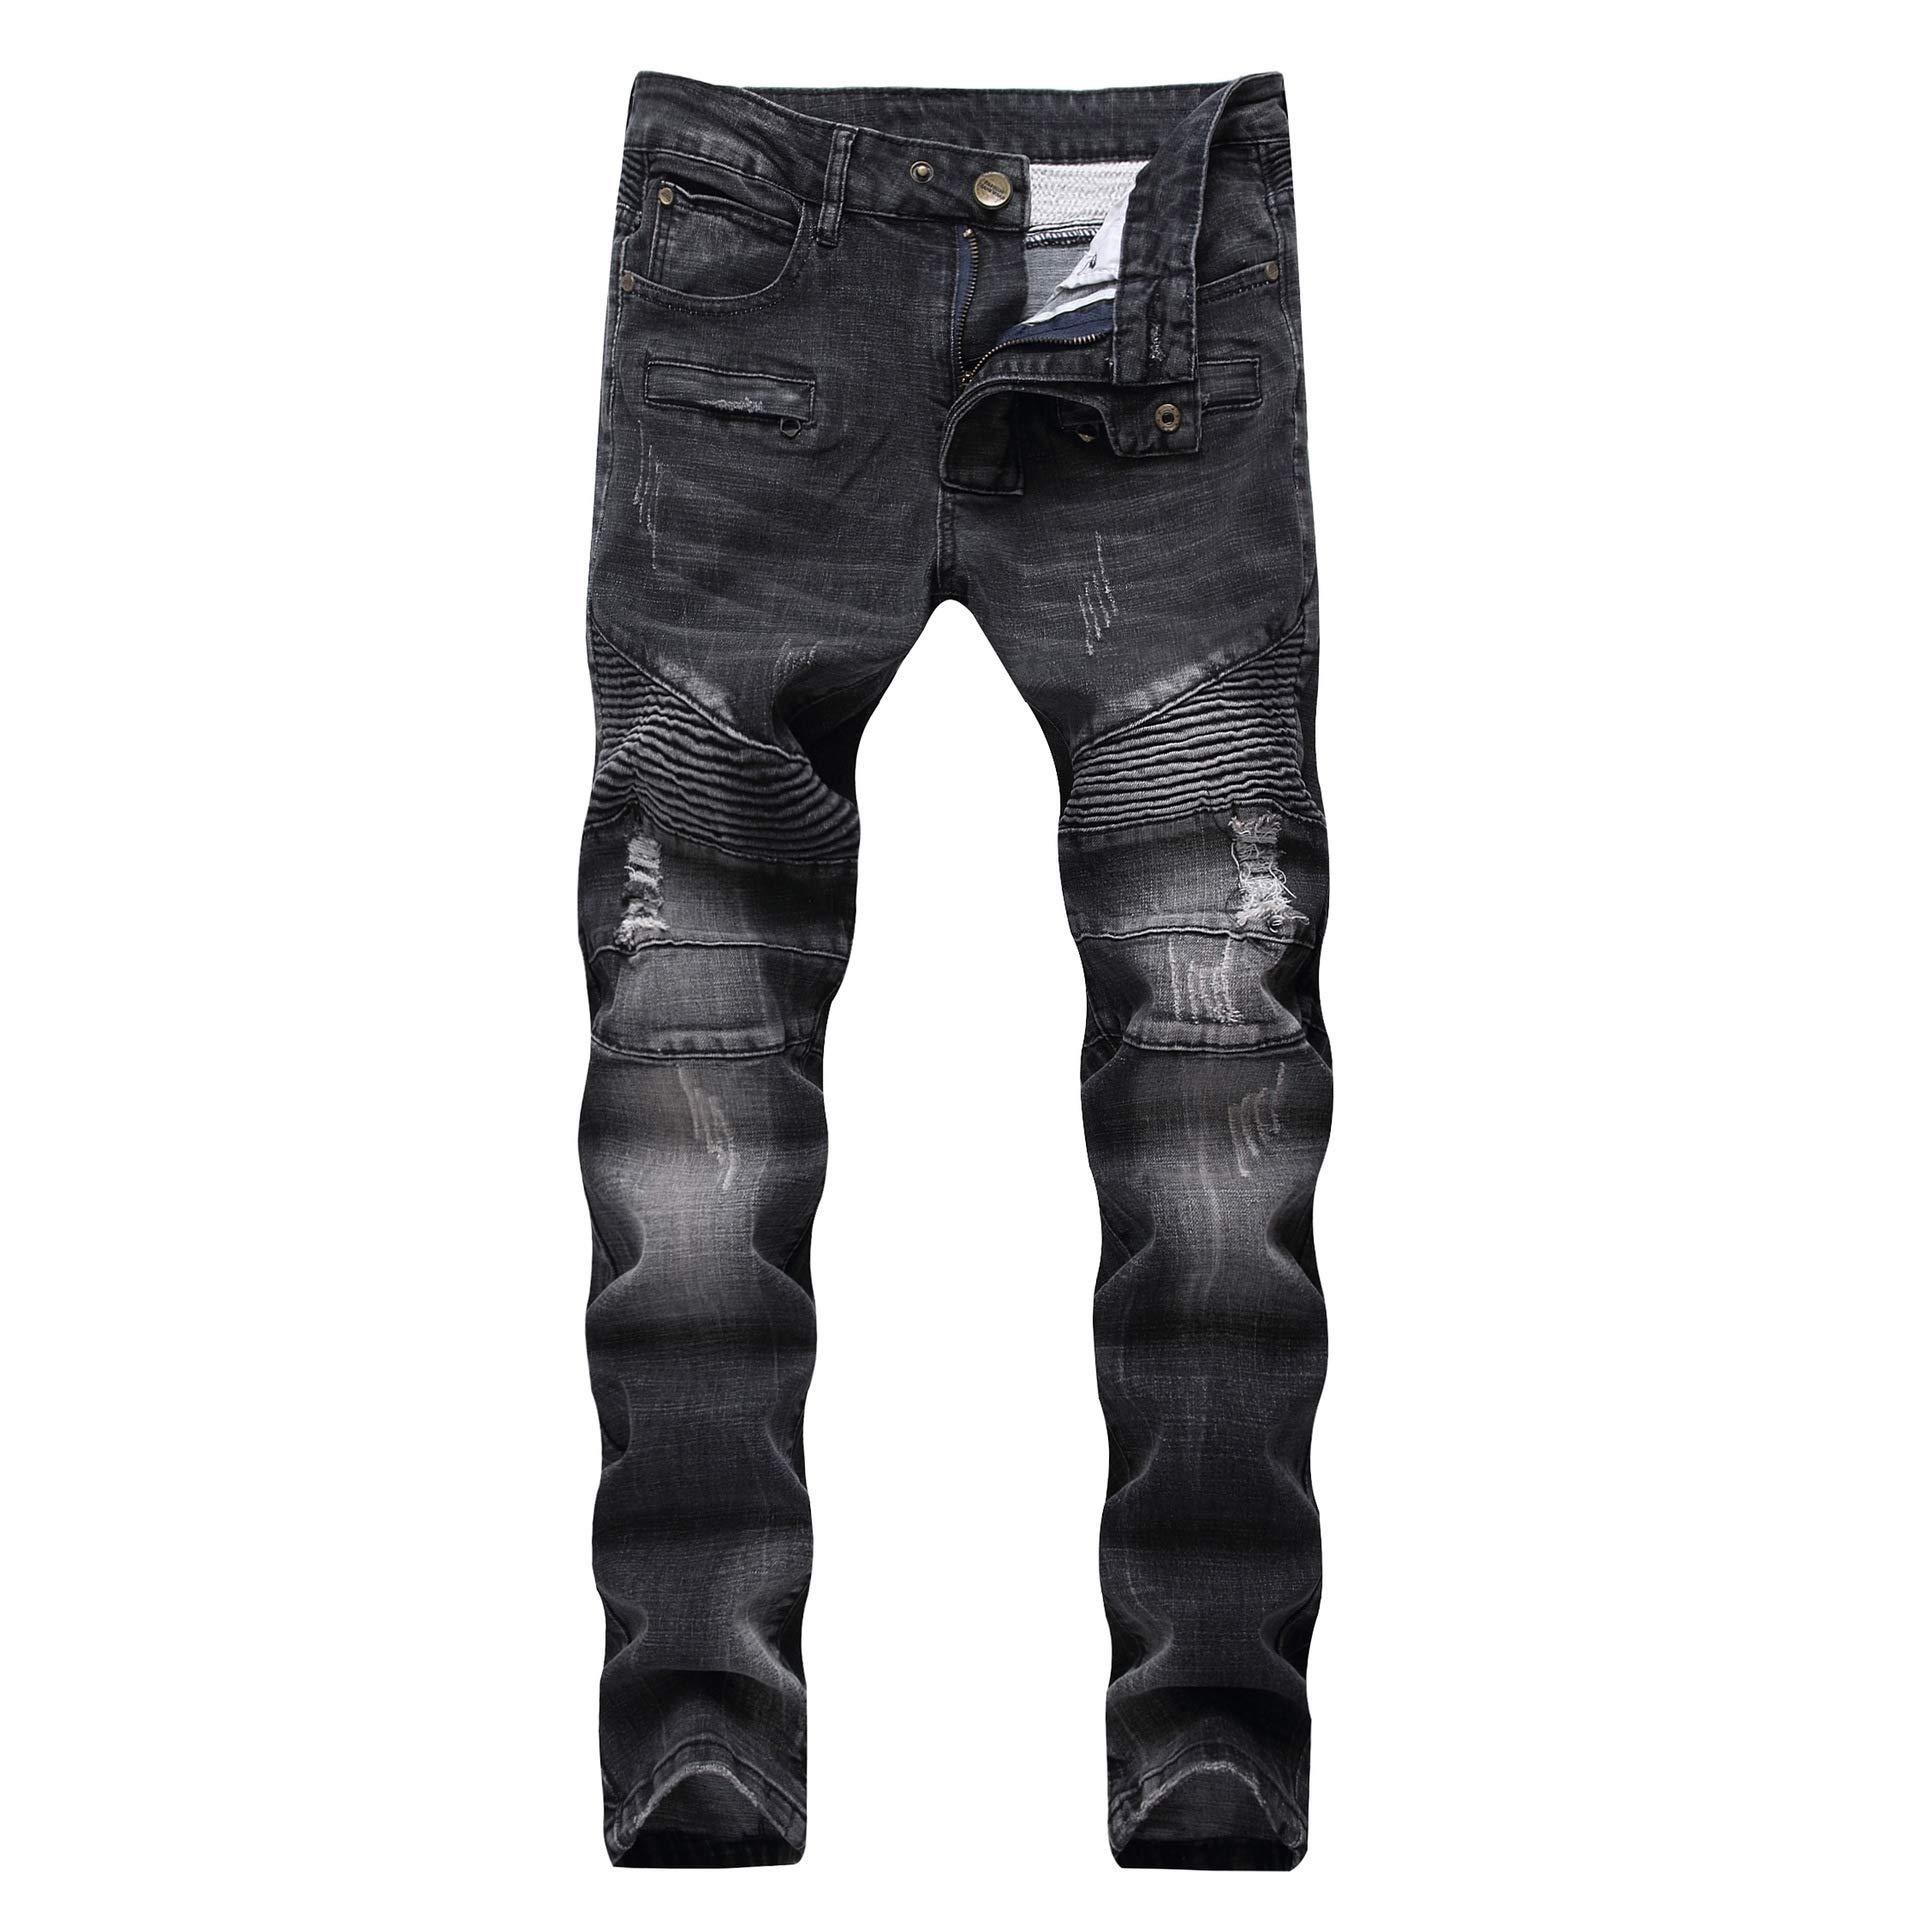 Liuhond Skinny Fashion Men's Ripped Straight Holes Hip Hop Biker Stretchy Jeans (32Wx31L, 109black)